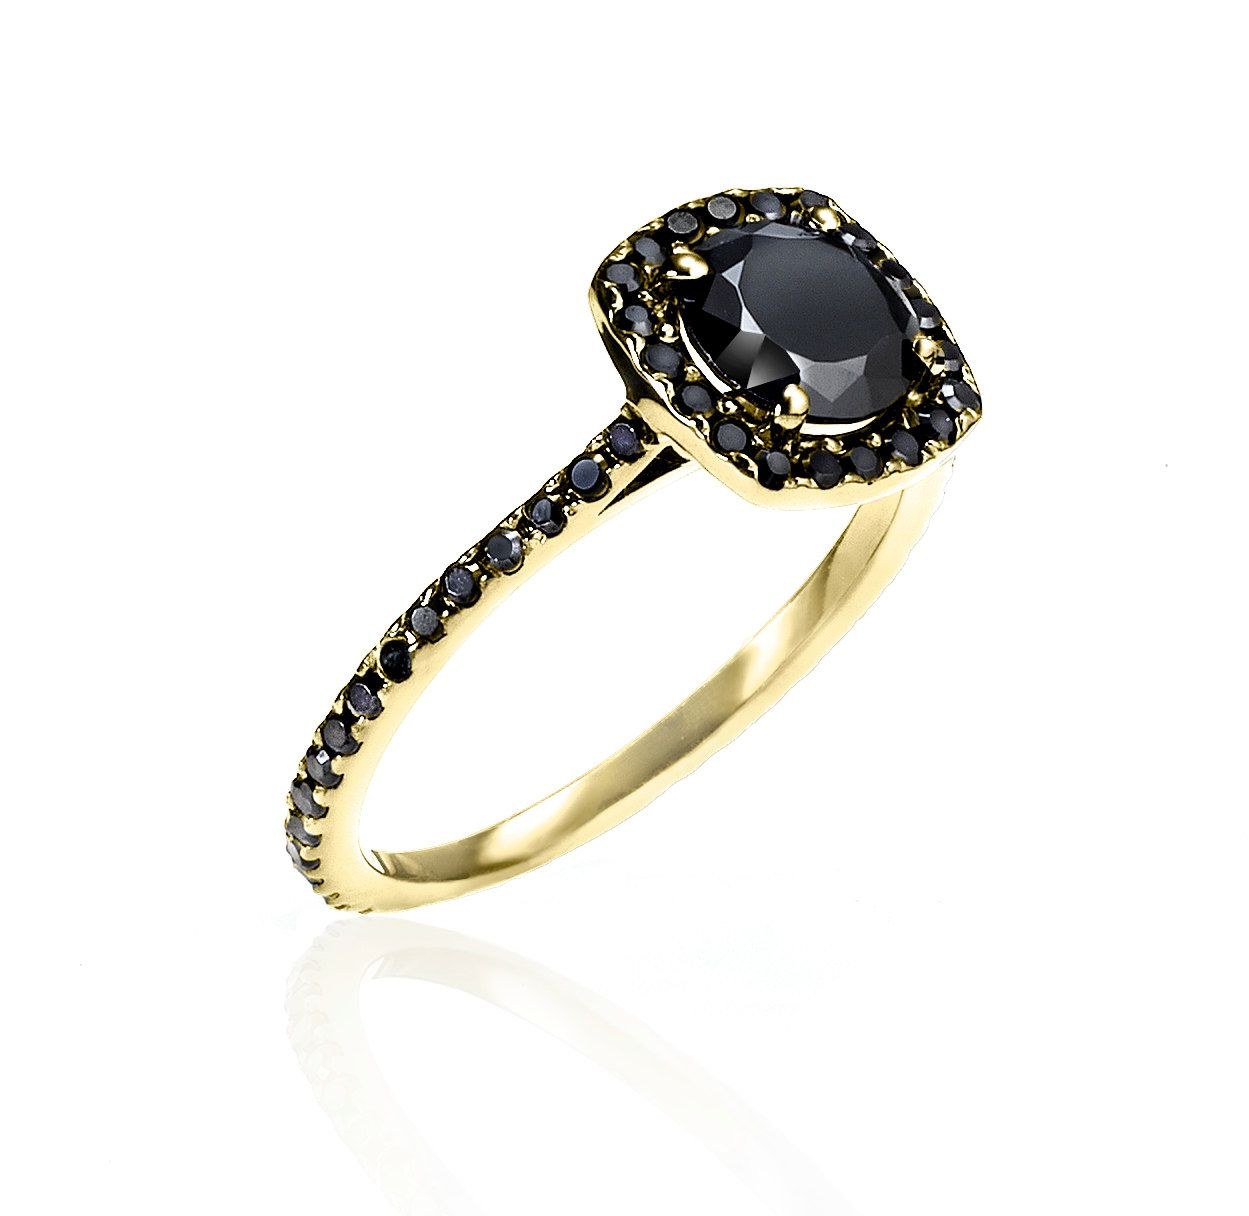 Almost Eternity Yellow Gold & Black Diamond Ring by IzandCo on Etsy https://www.etsy.com/listing/158439948/almost-eternity-yellow-gold-black